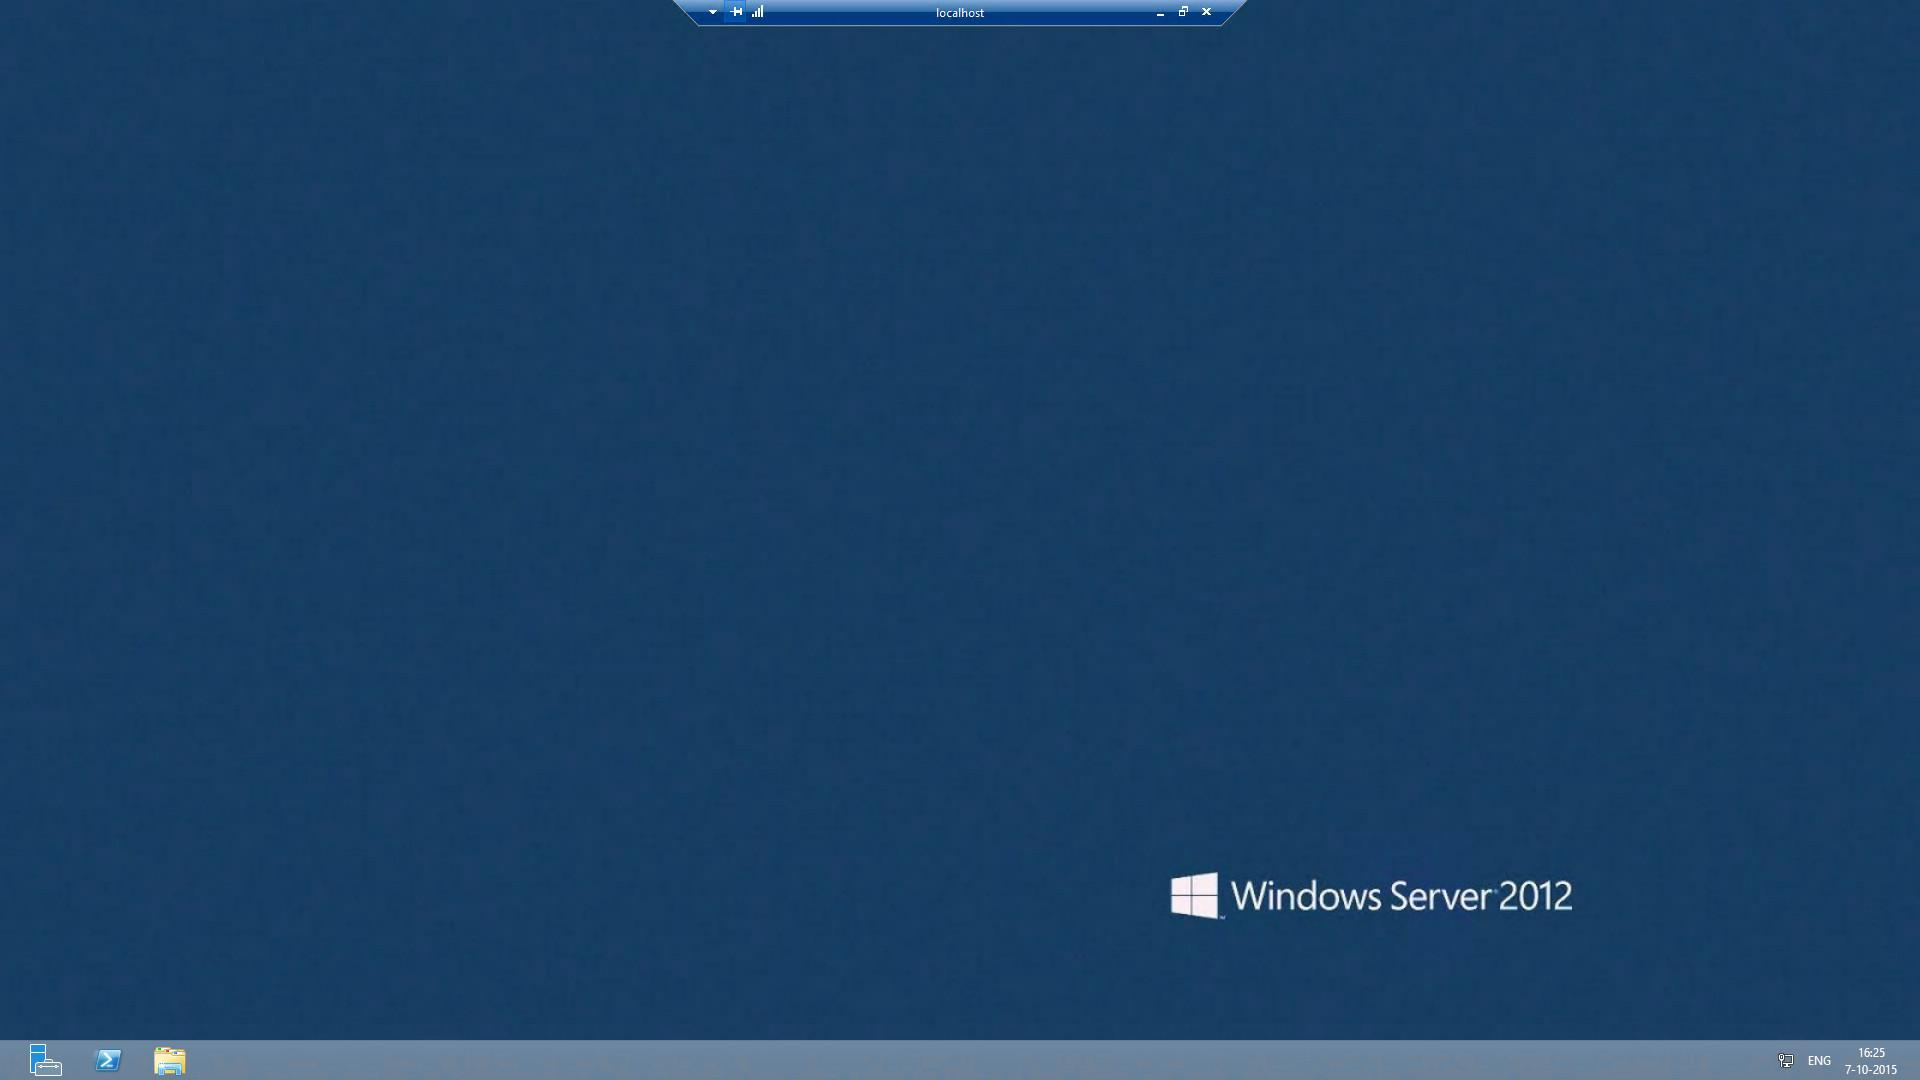 Windows Server Wallpaper (69+ images)